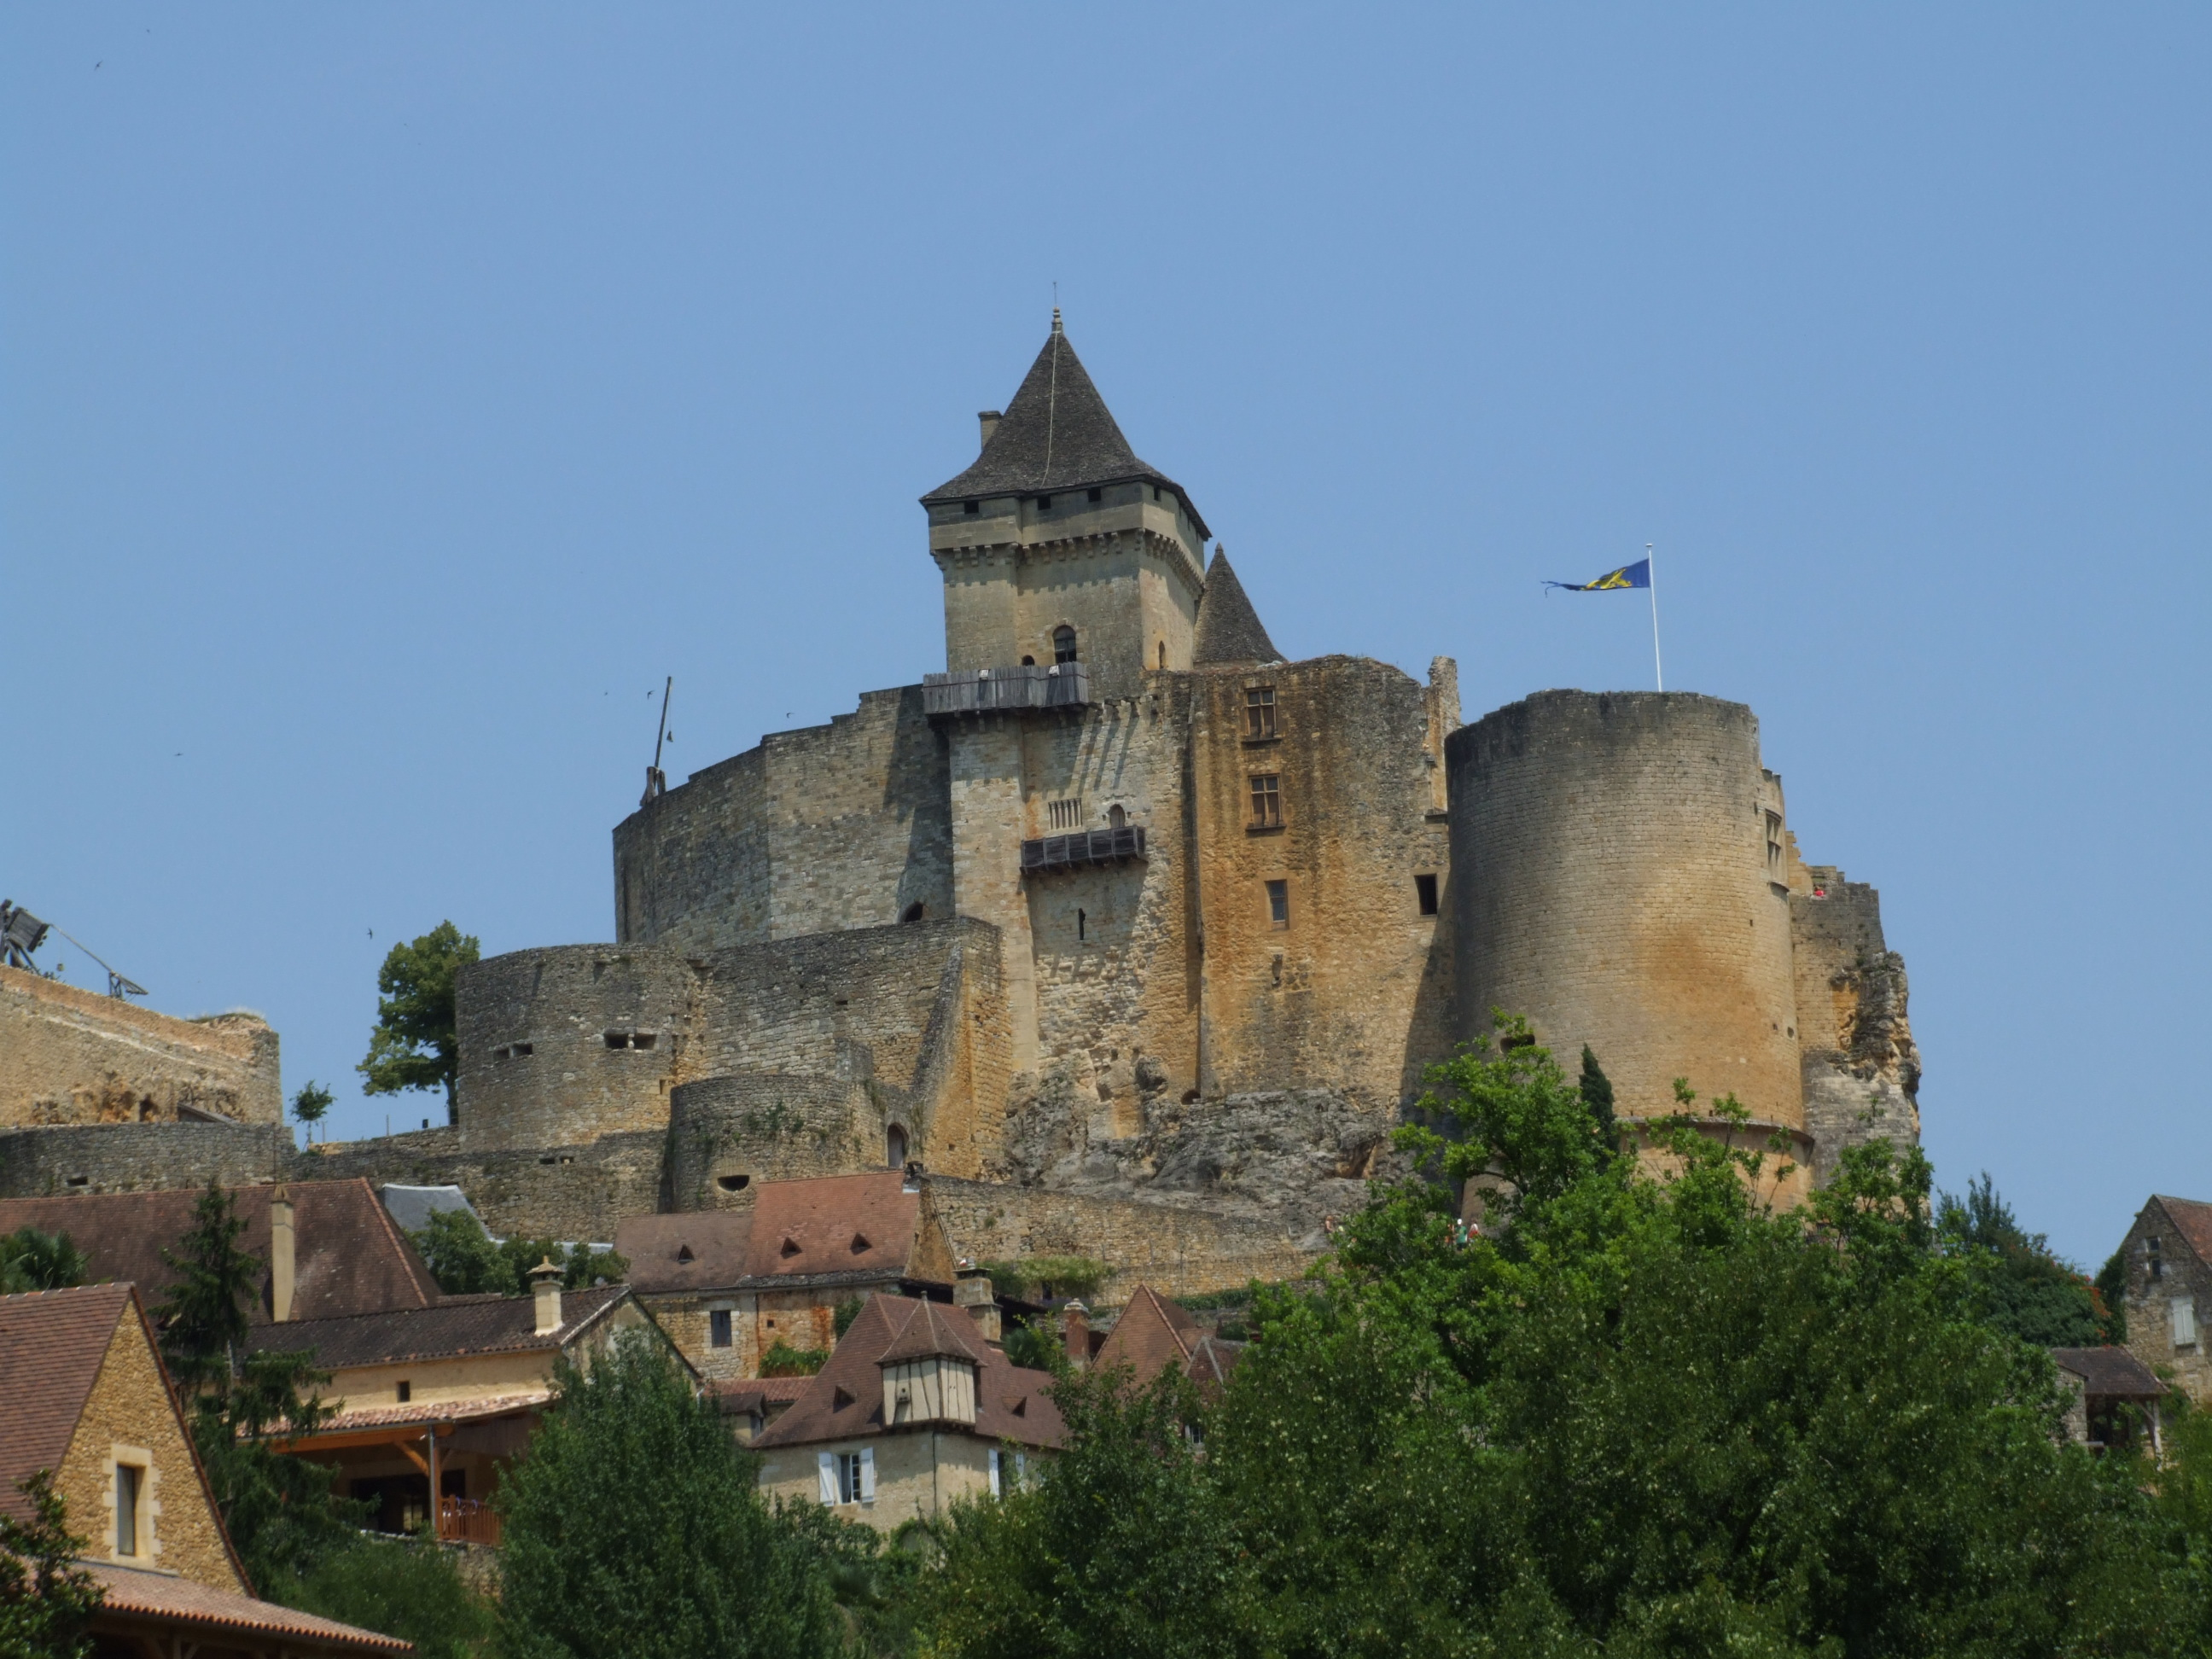 http://upload.wikimedia.org/wikipedia/commons/2/2b/Castelnaud-la-Chapelle_50.jpg